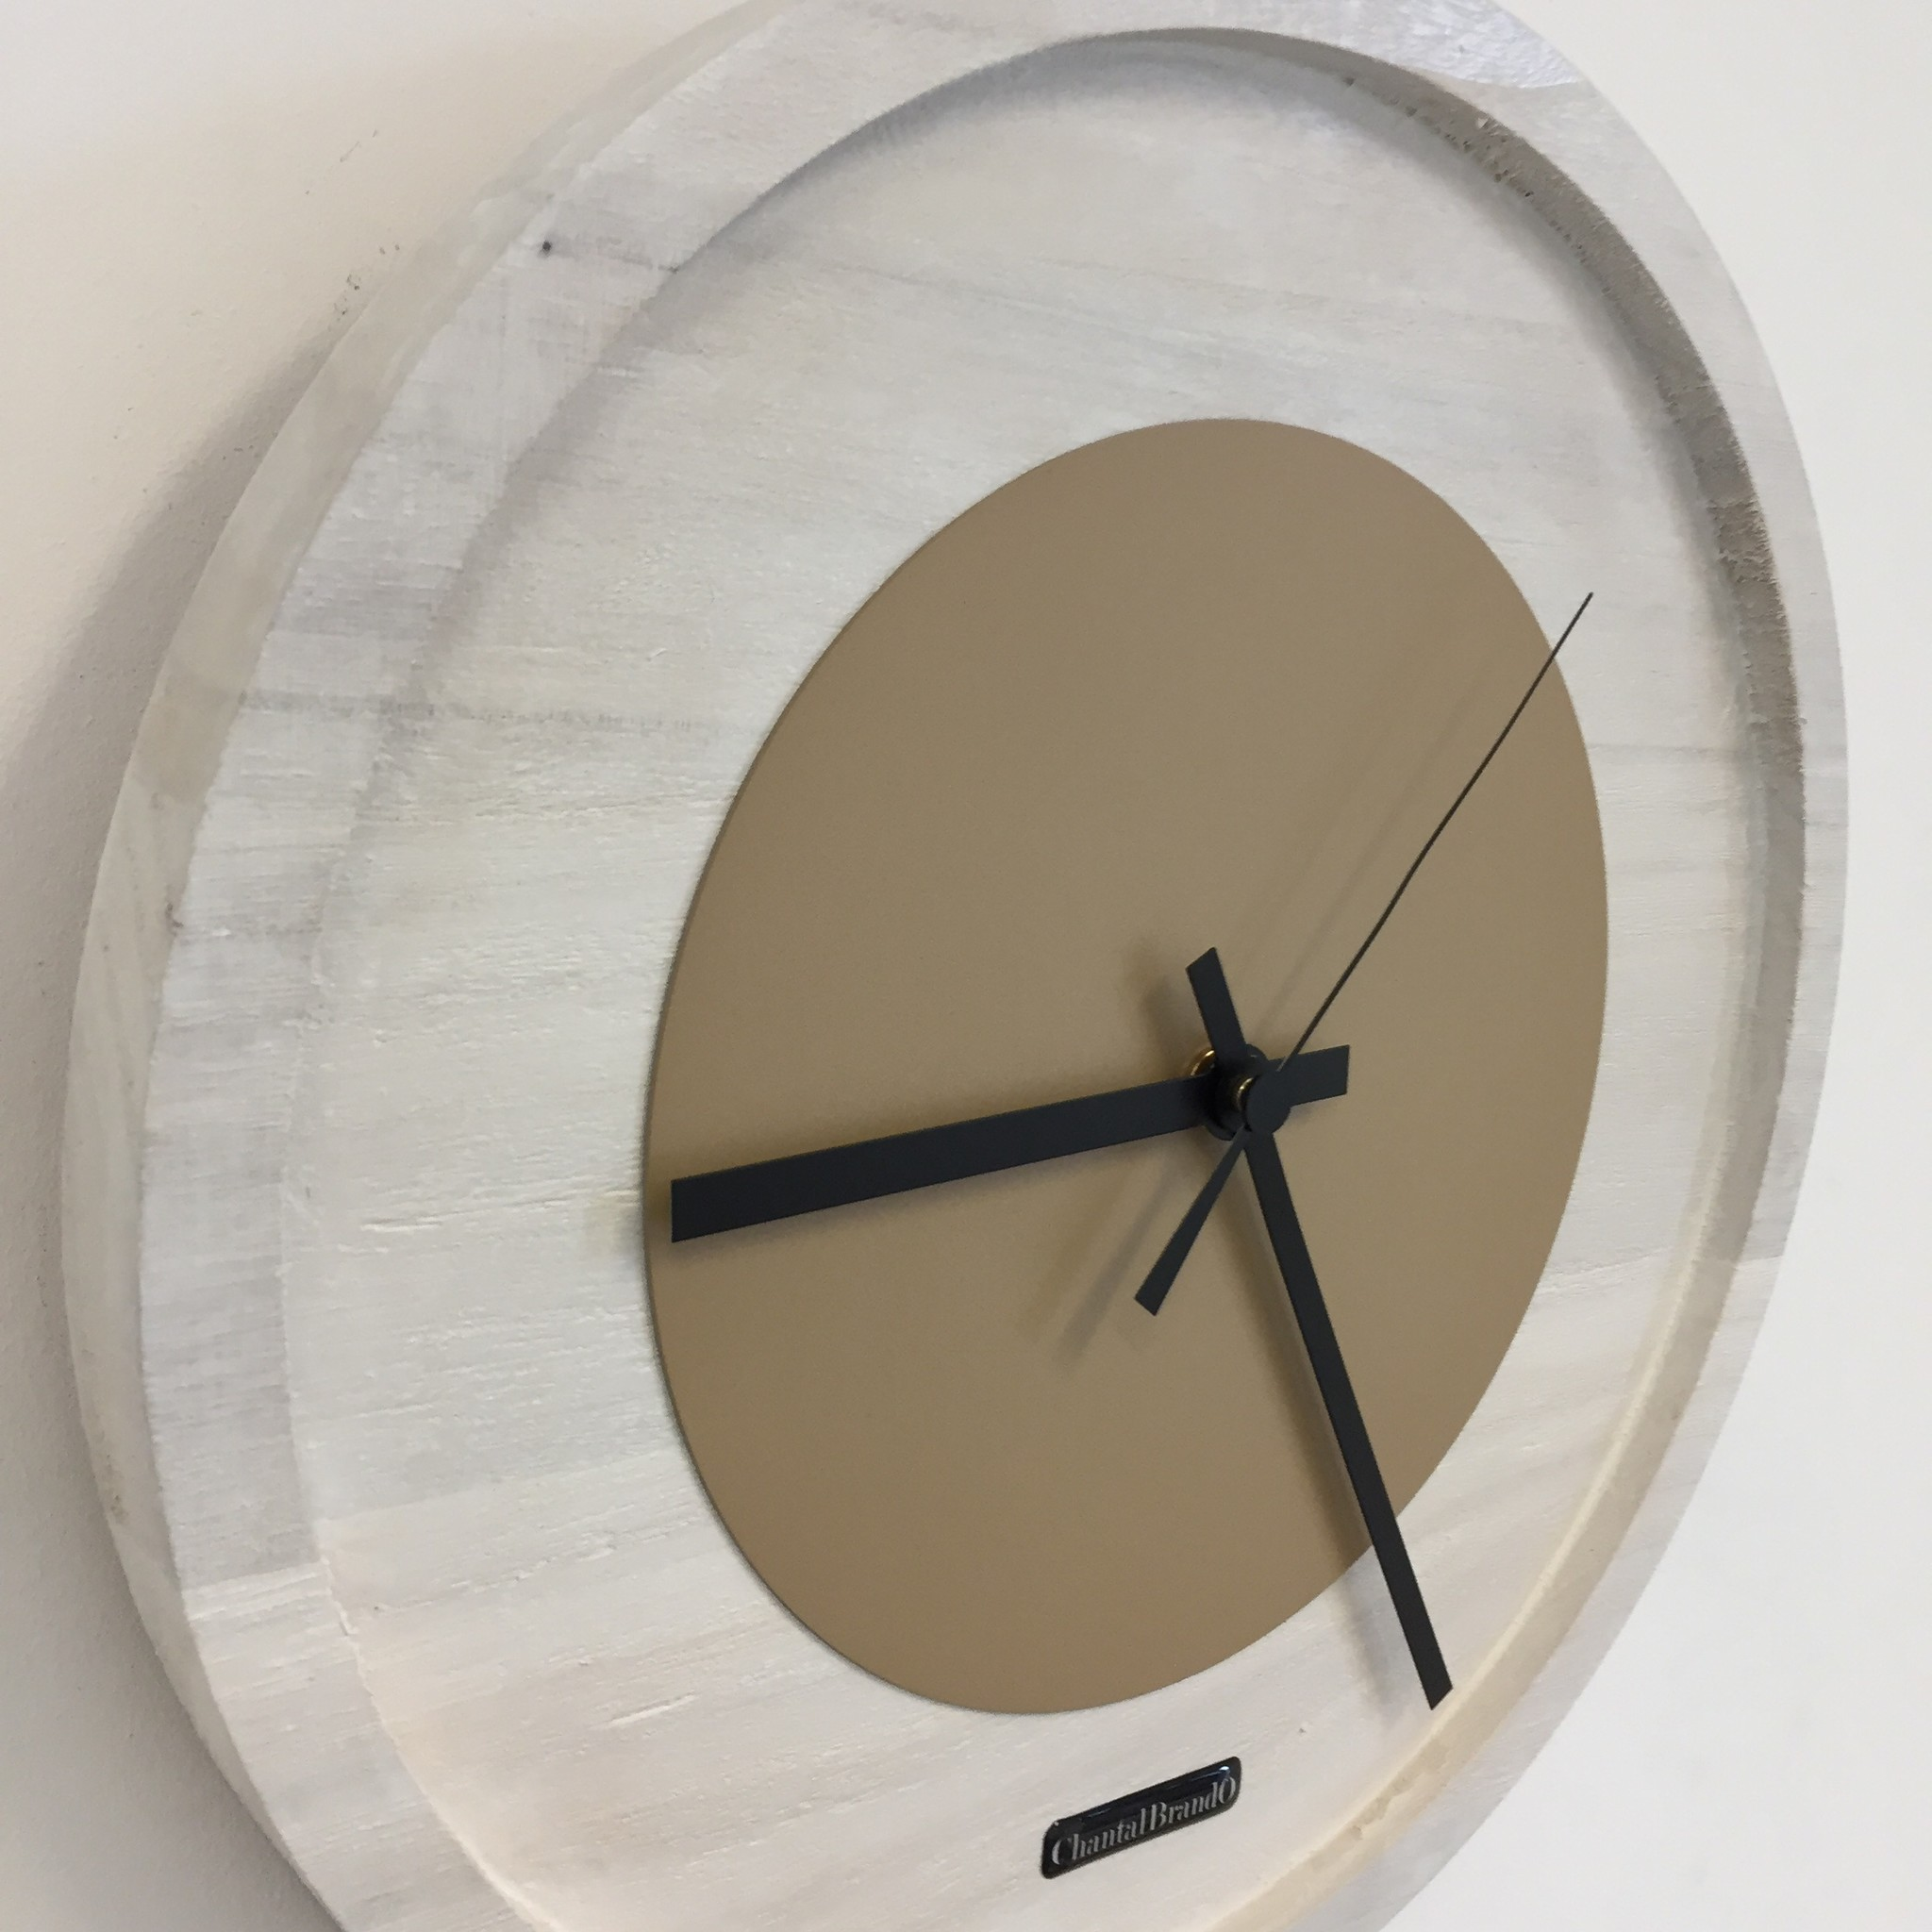 ChantalBrandO Wandklok Quinten White & Beige Modern Dutch Design